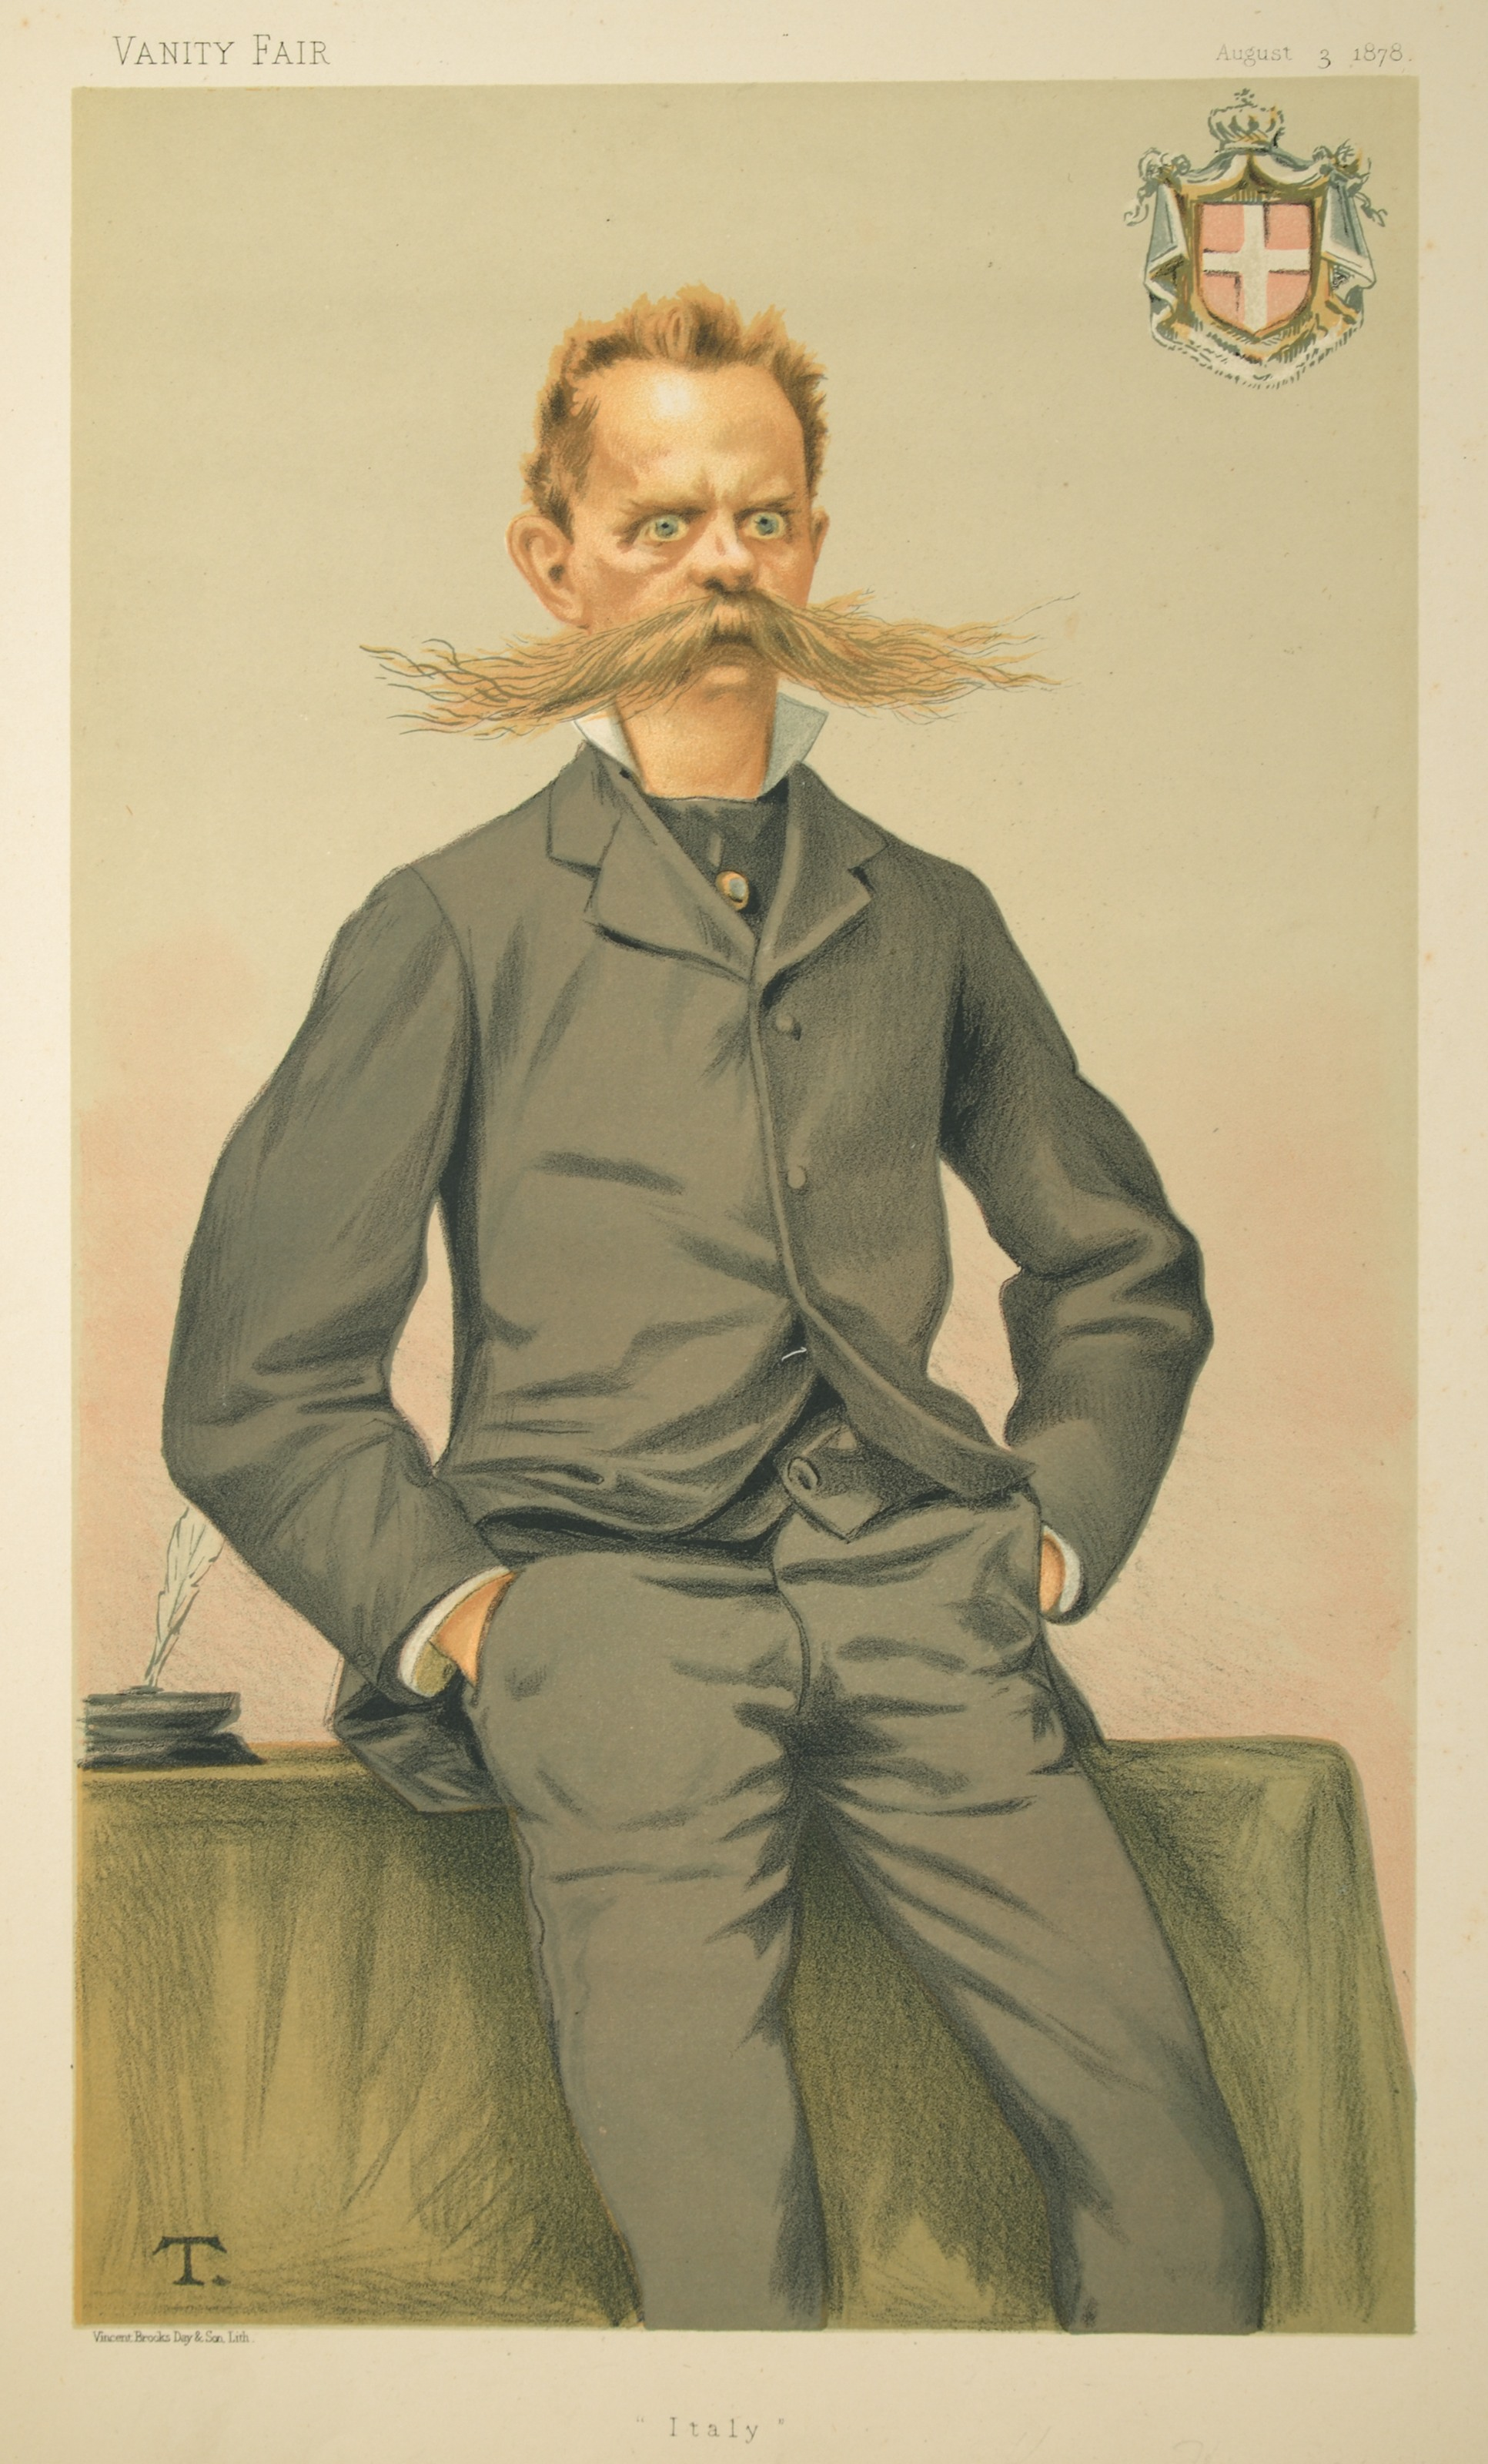 Grants For College >> File:Umberto I of Italy, Vanity Fair, 1878-08-03.jpg ...